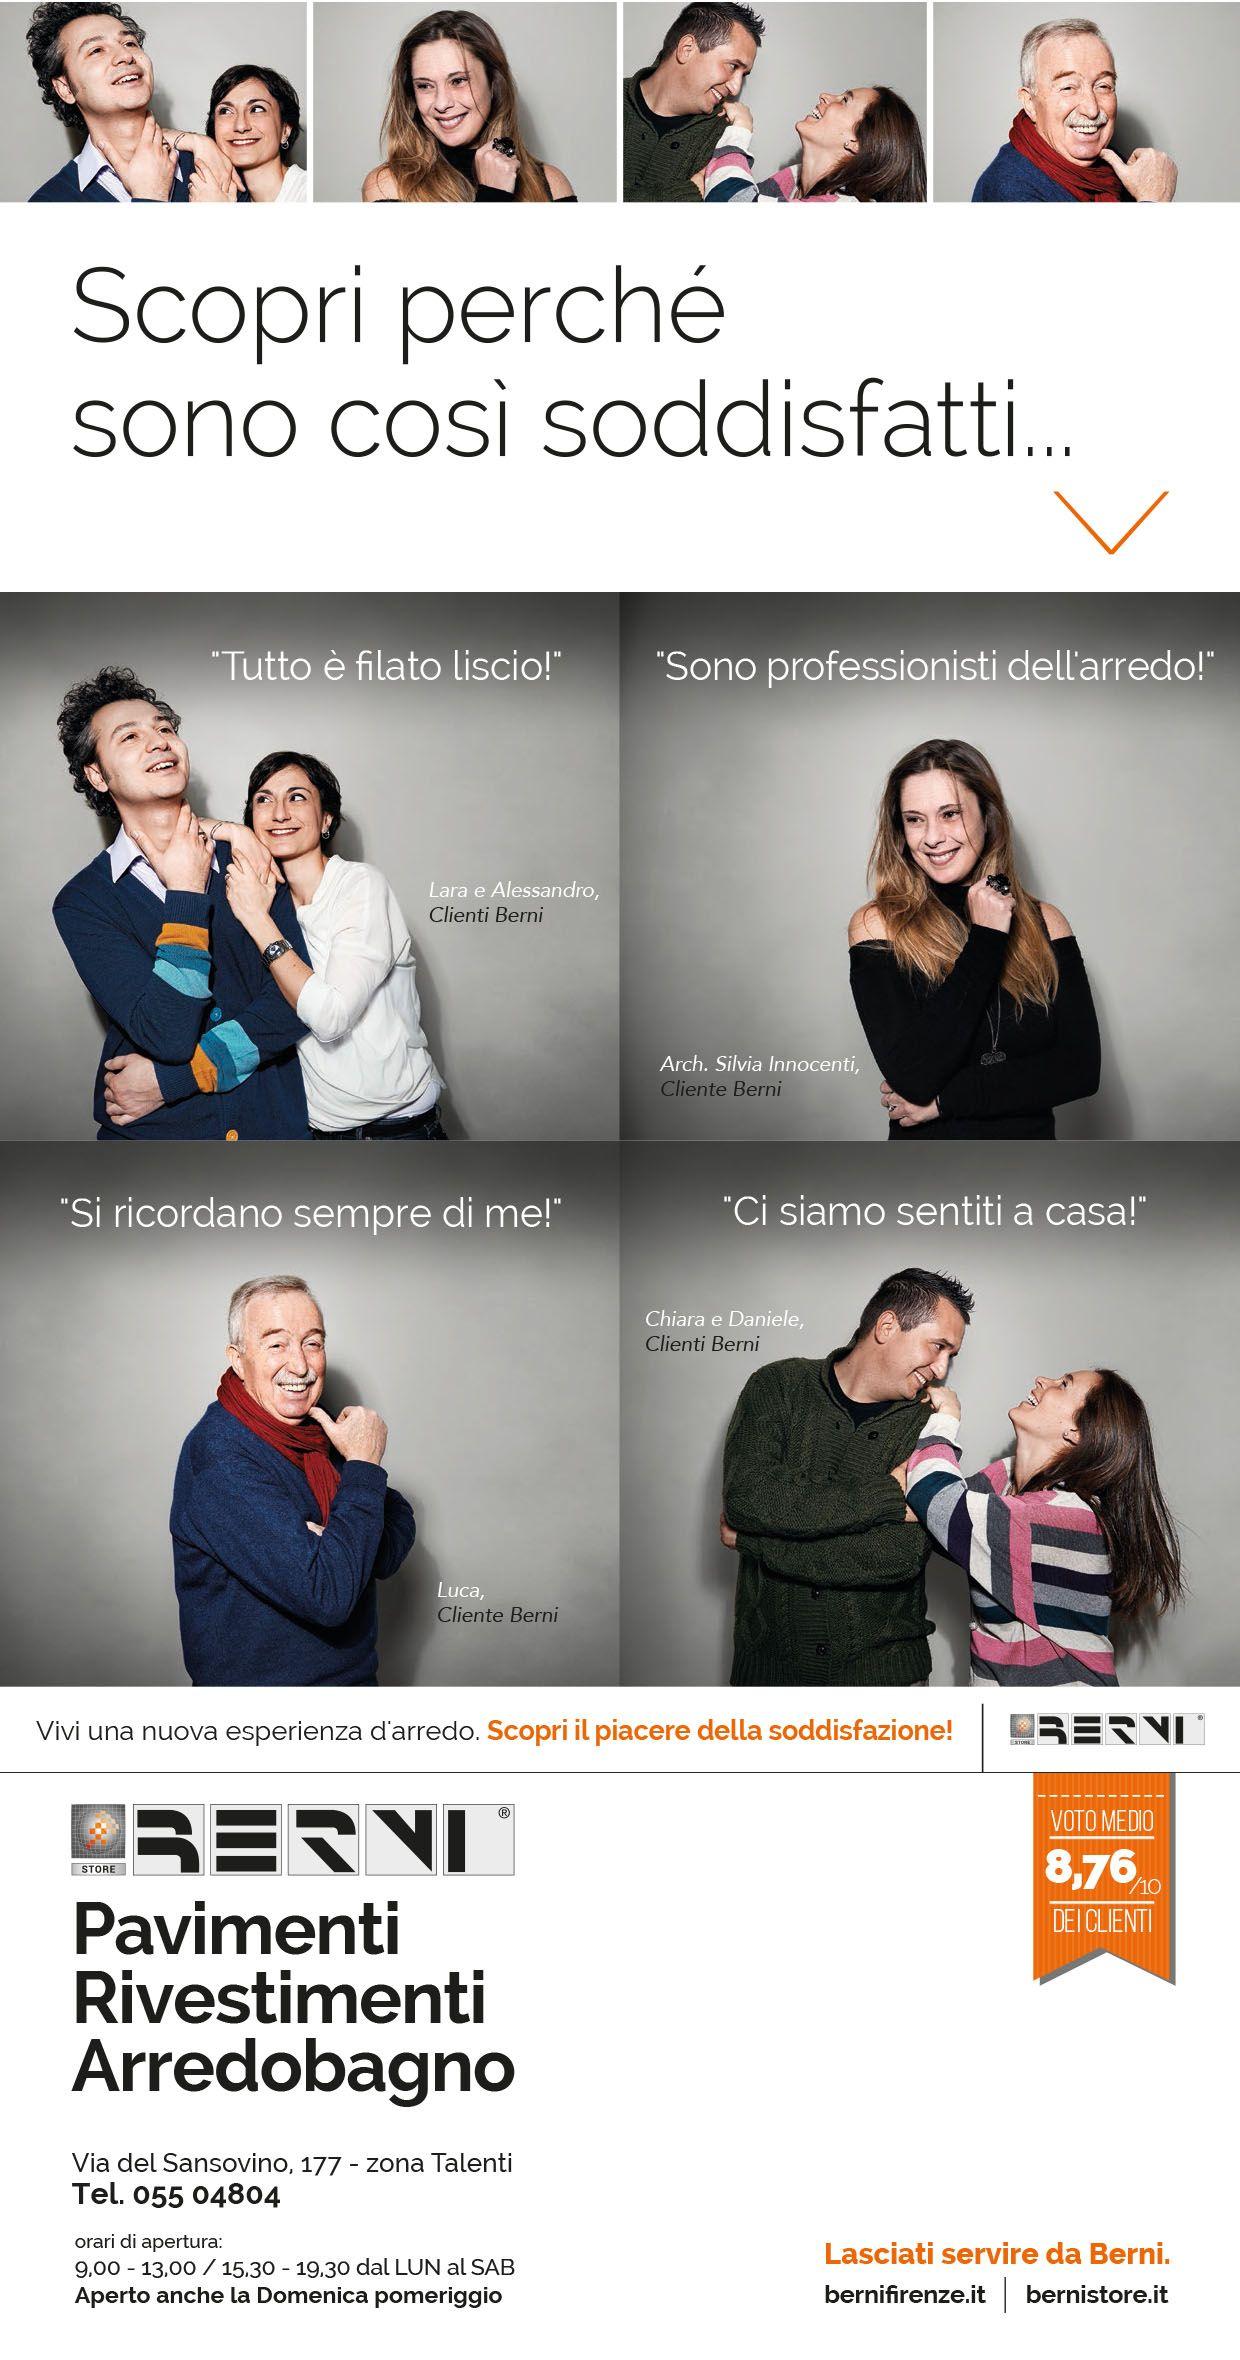 berni advertising 2015 - flyer | adv berni 2015 | pinterest - Berni Arredo Bagno